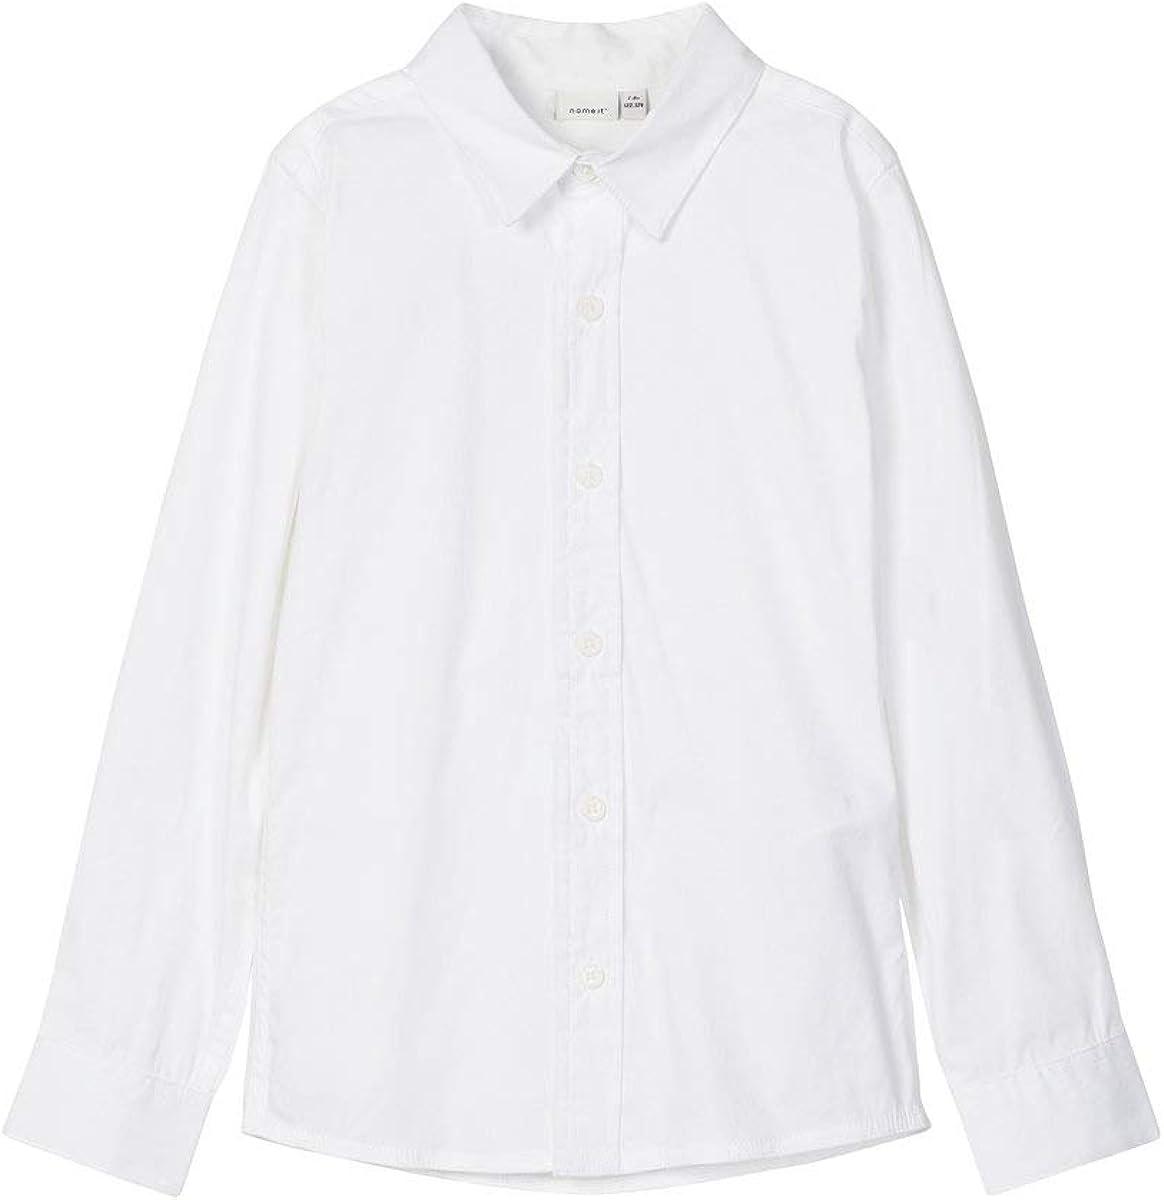 NAME IT Nkmfred LS Slim Shirt Noos Camisa para Niños